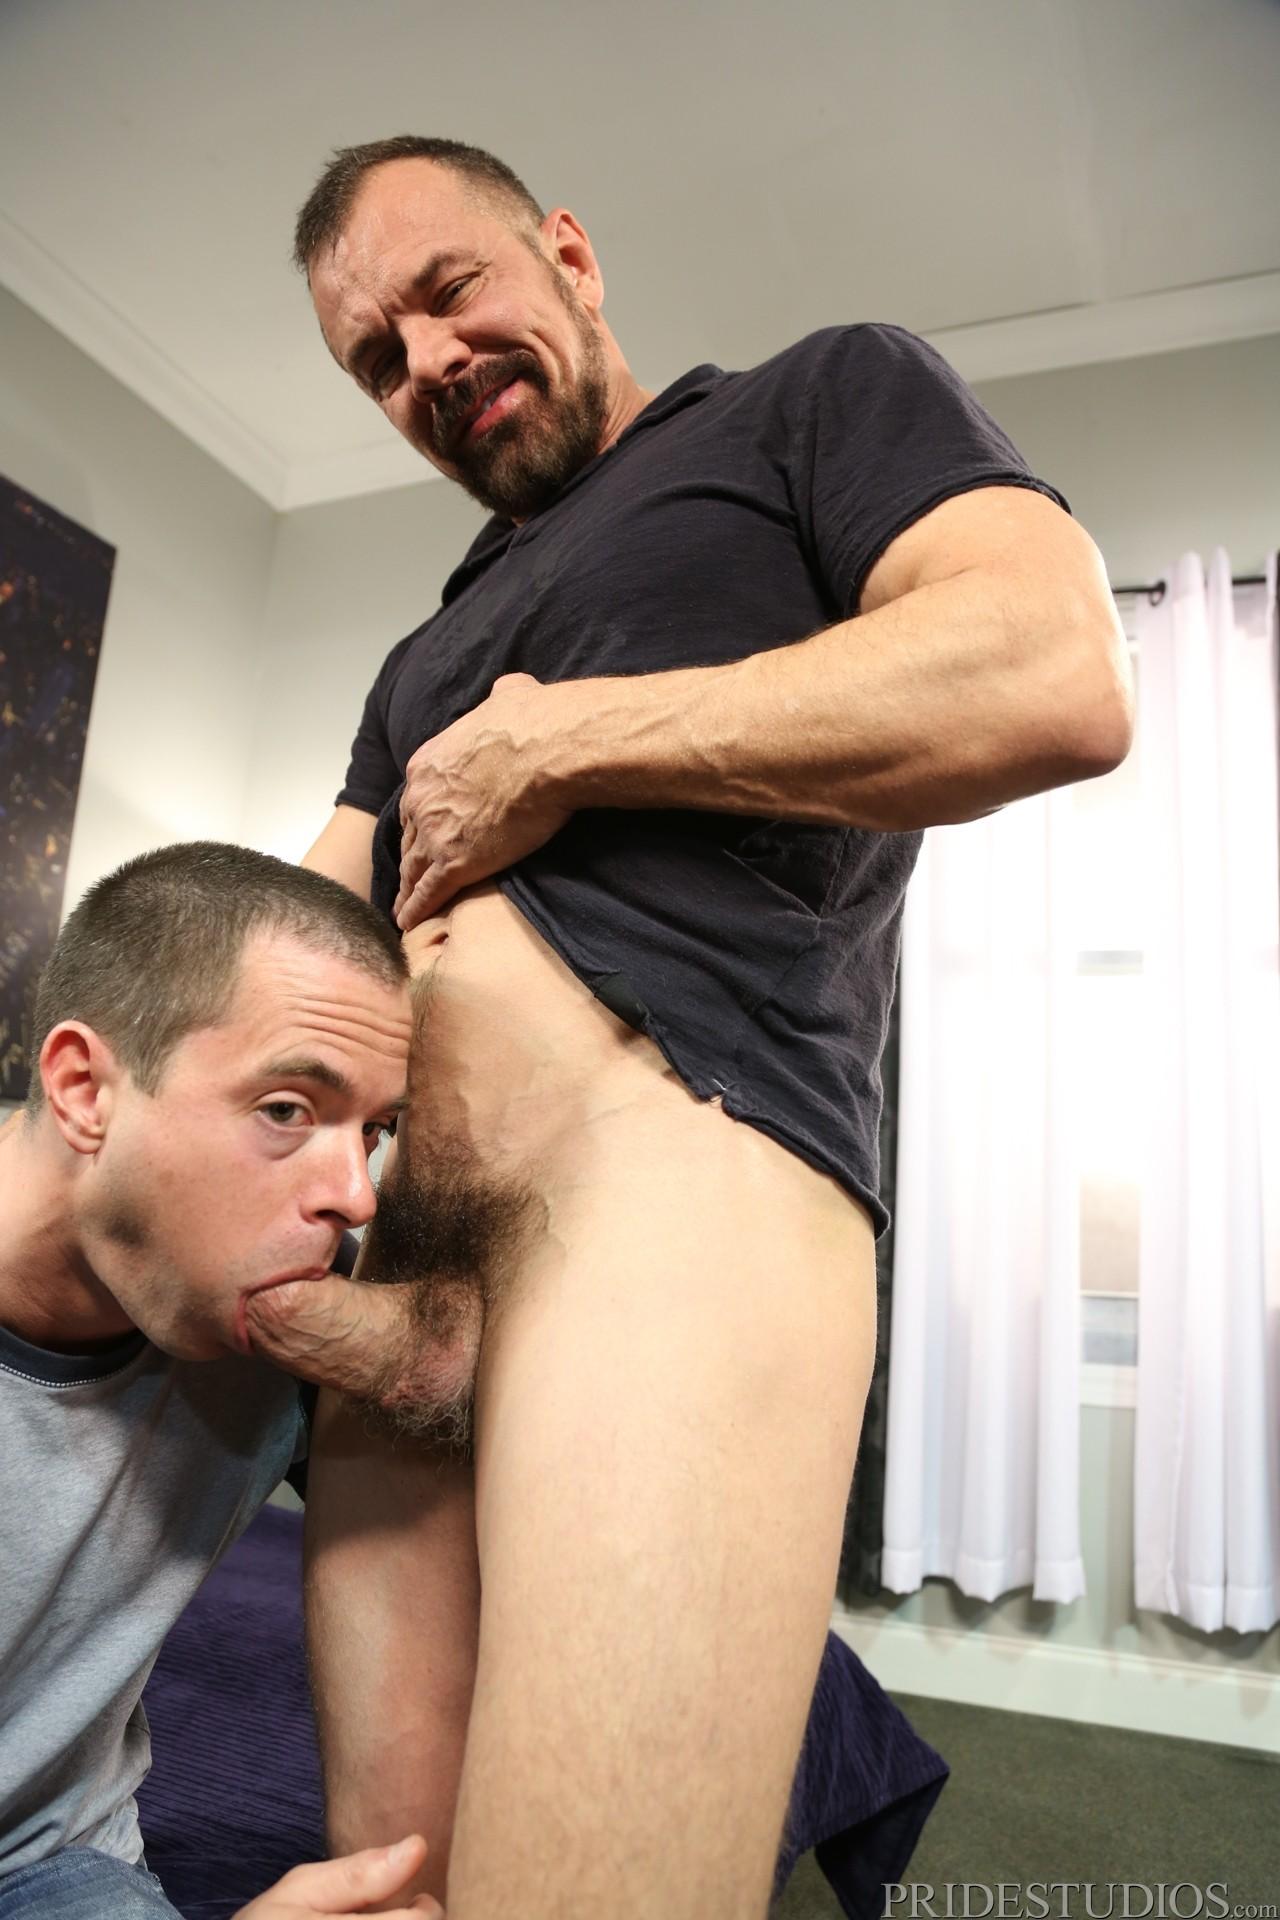 Bisexual 2095 videos Fat Mom Tube  Free BBW Fat